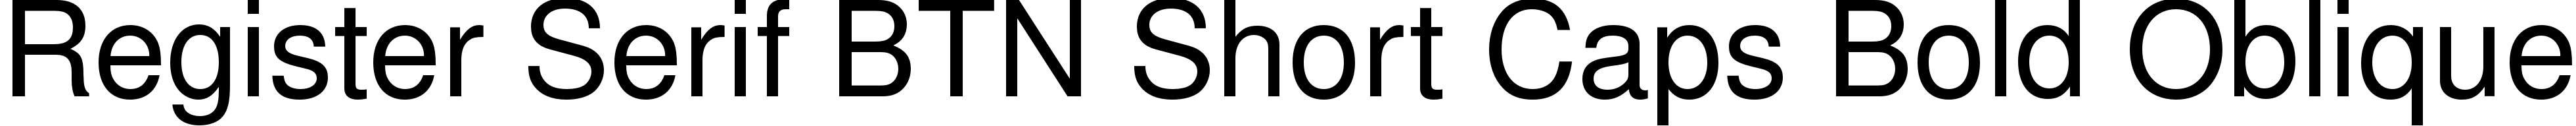 Register Serif BTN Short Caps Bold Oblique